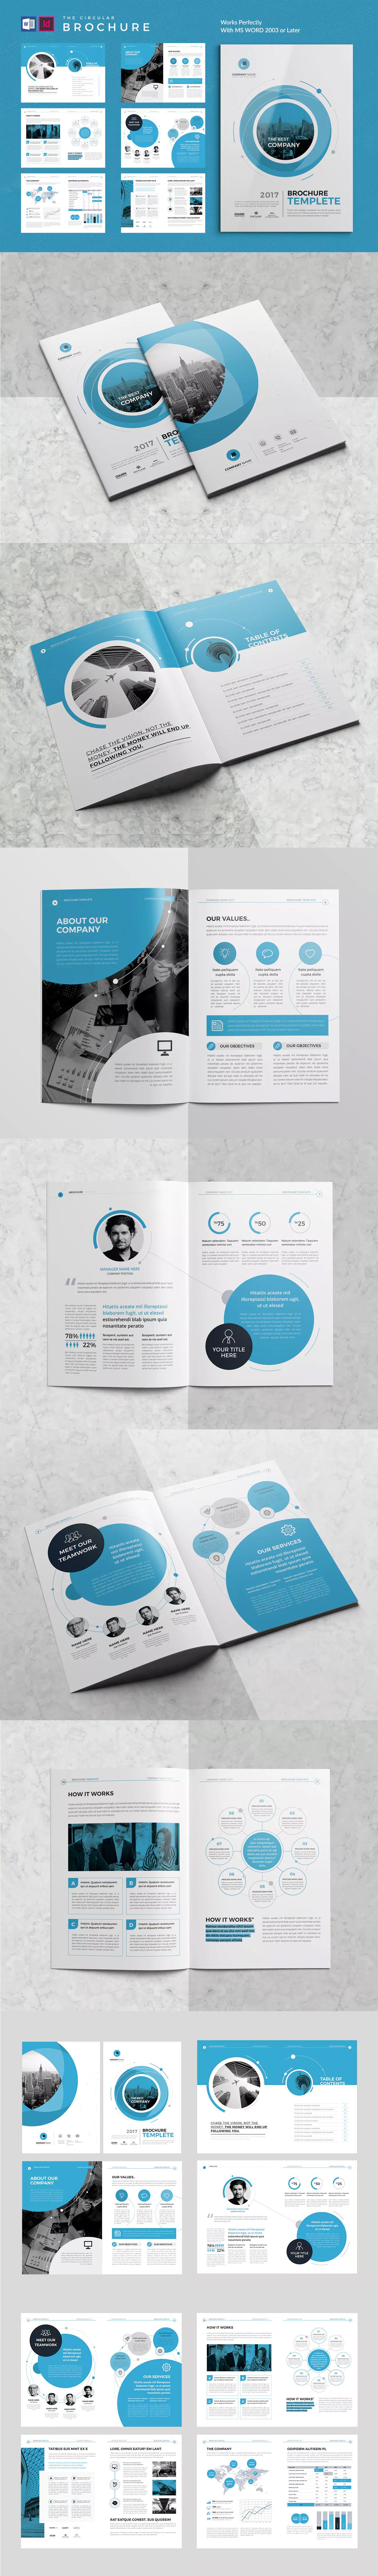 Co Brochure Template InDesign INDD MS Word A4 | diagramación ...